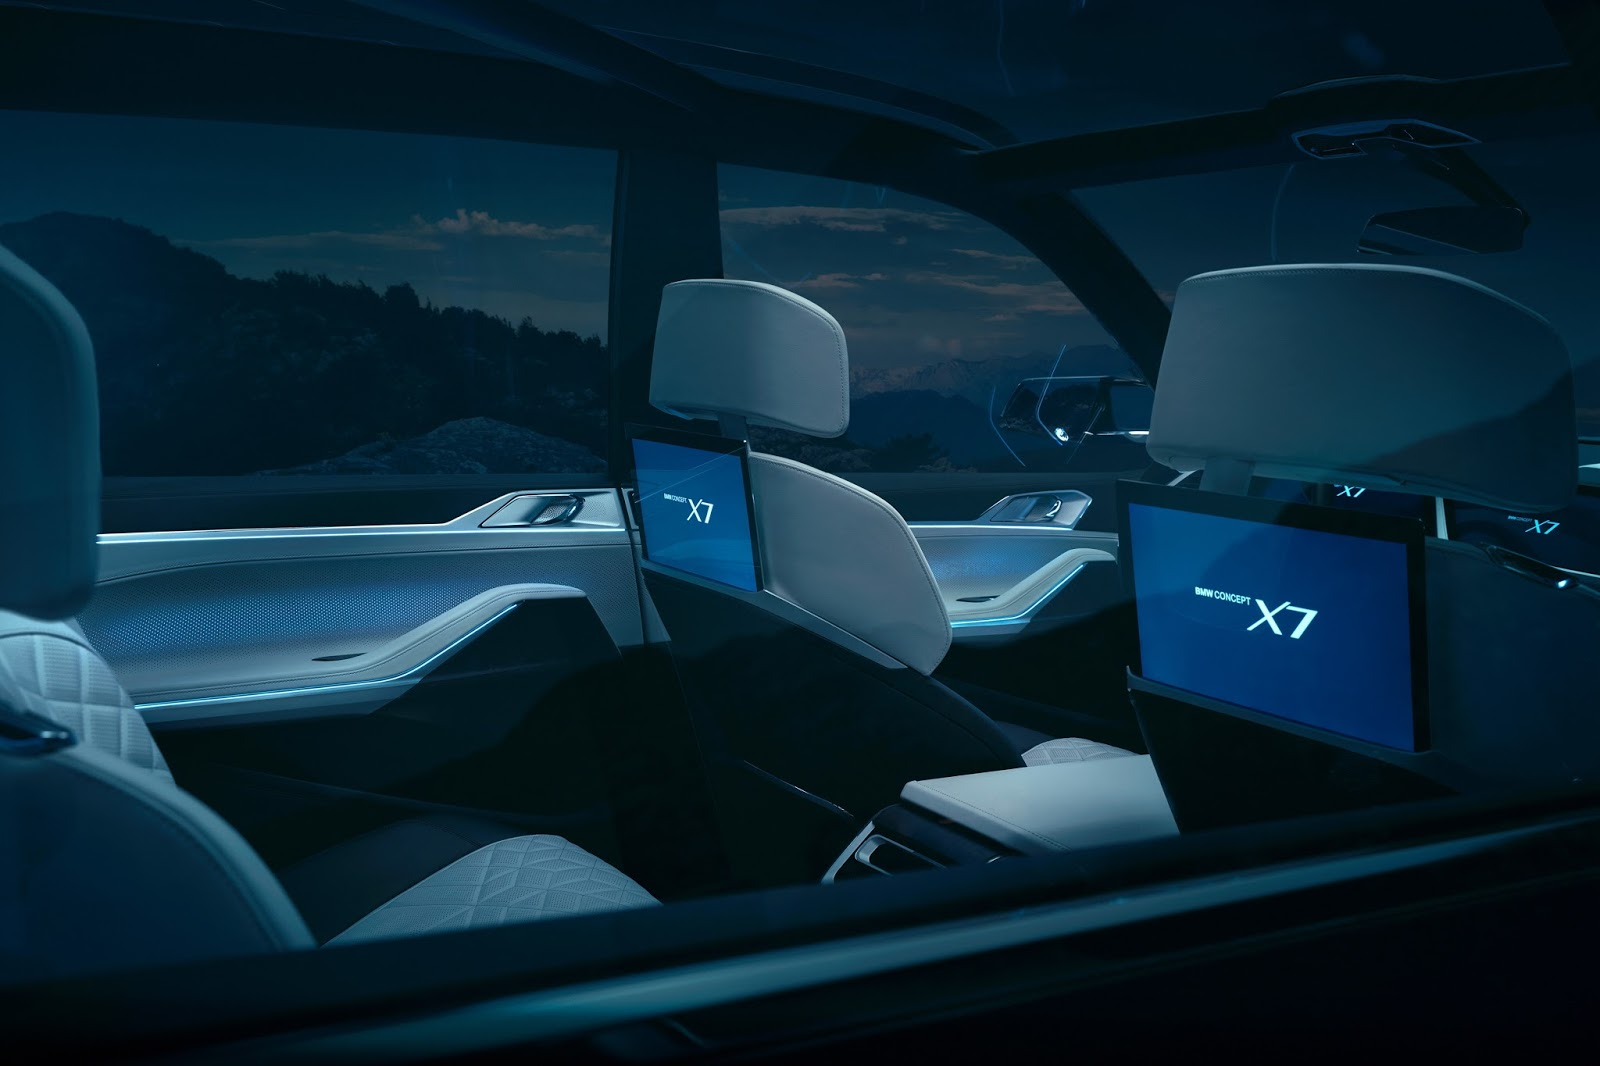 BMW-X7-iPerfomance-Concept-8.jpeg